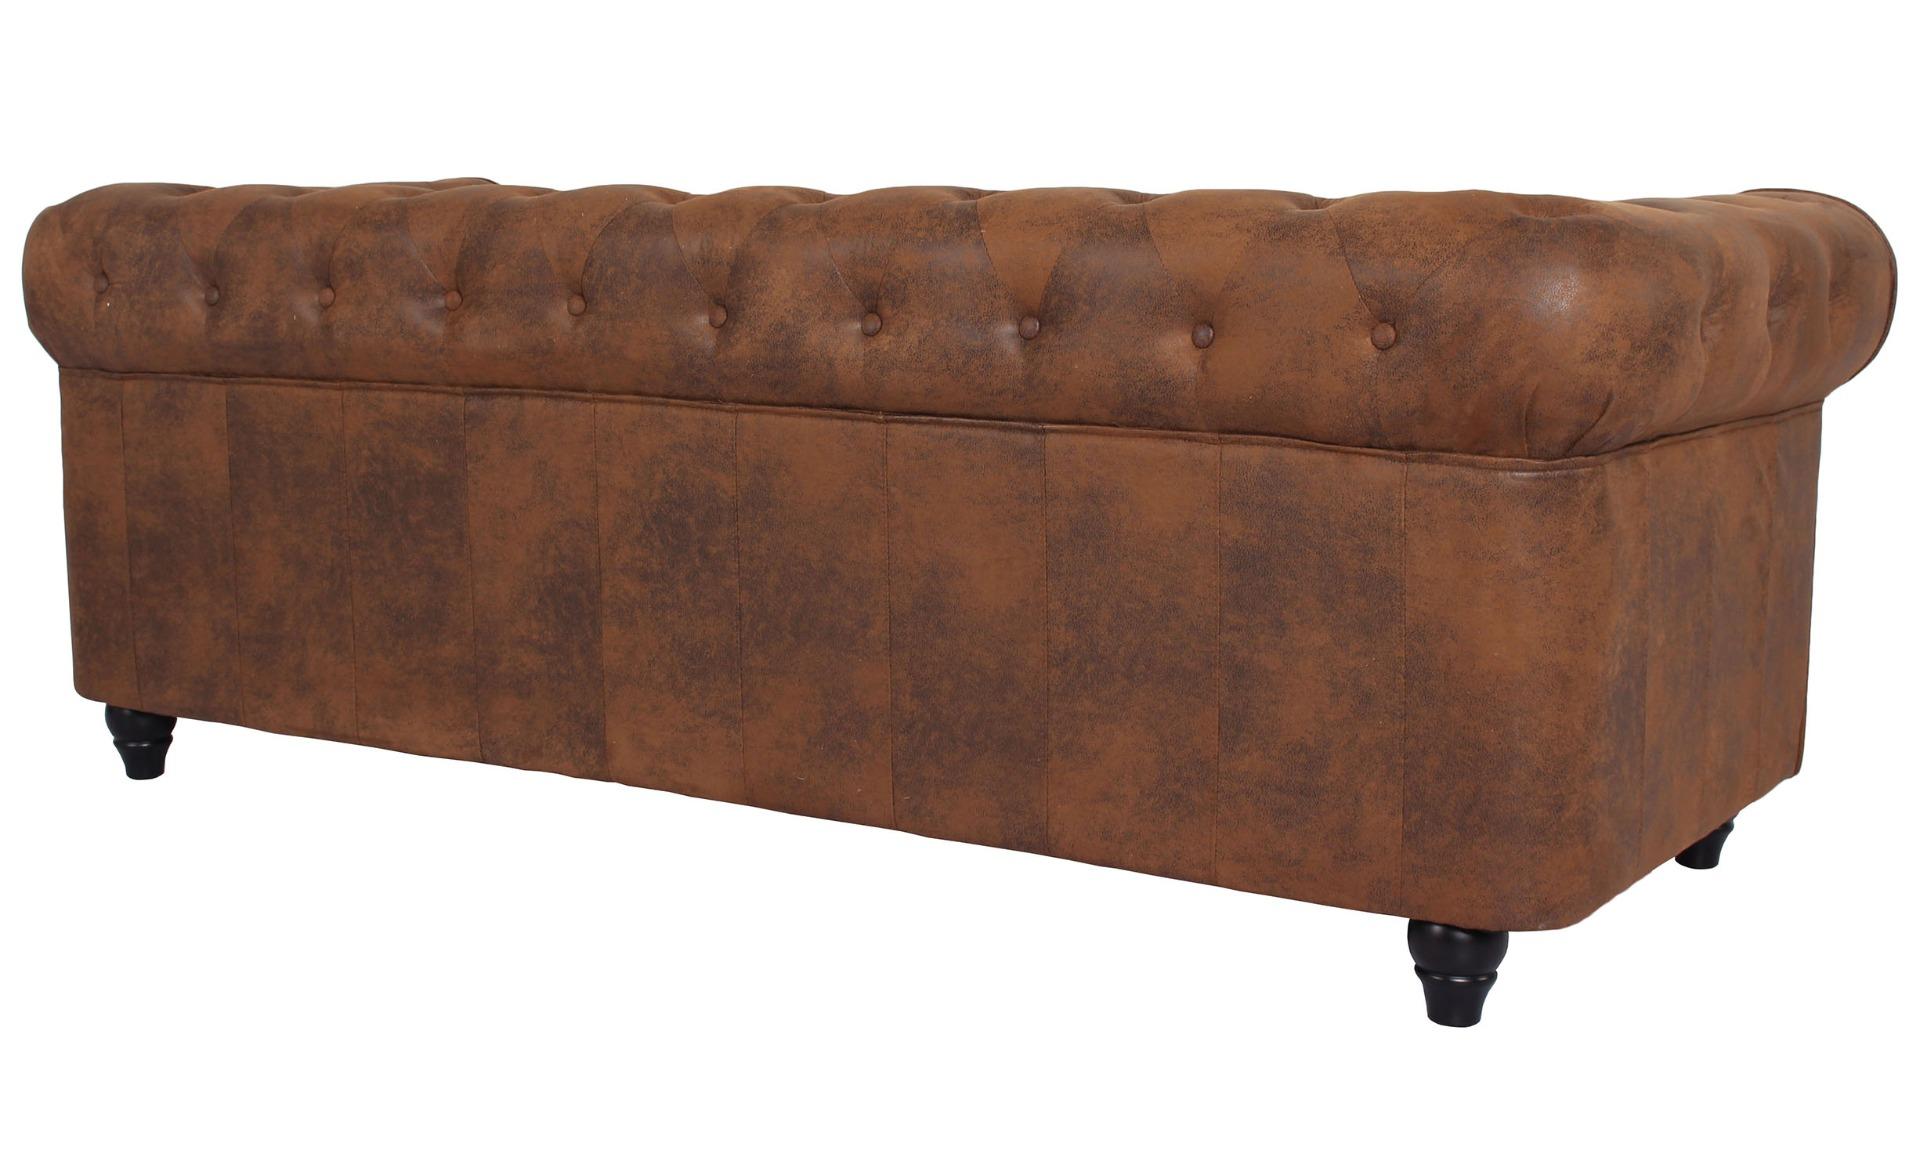 Grand Canapé Chesterfield 3-Sitzer Sofa Vintage